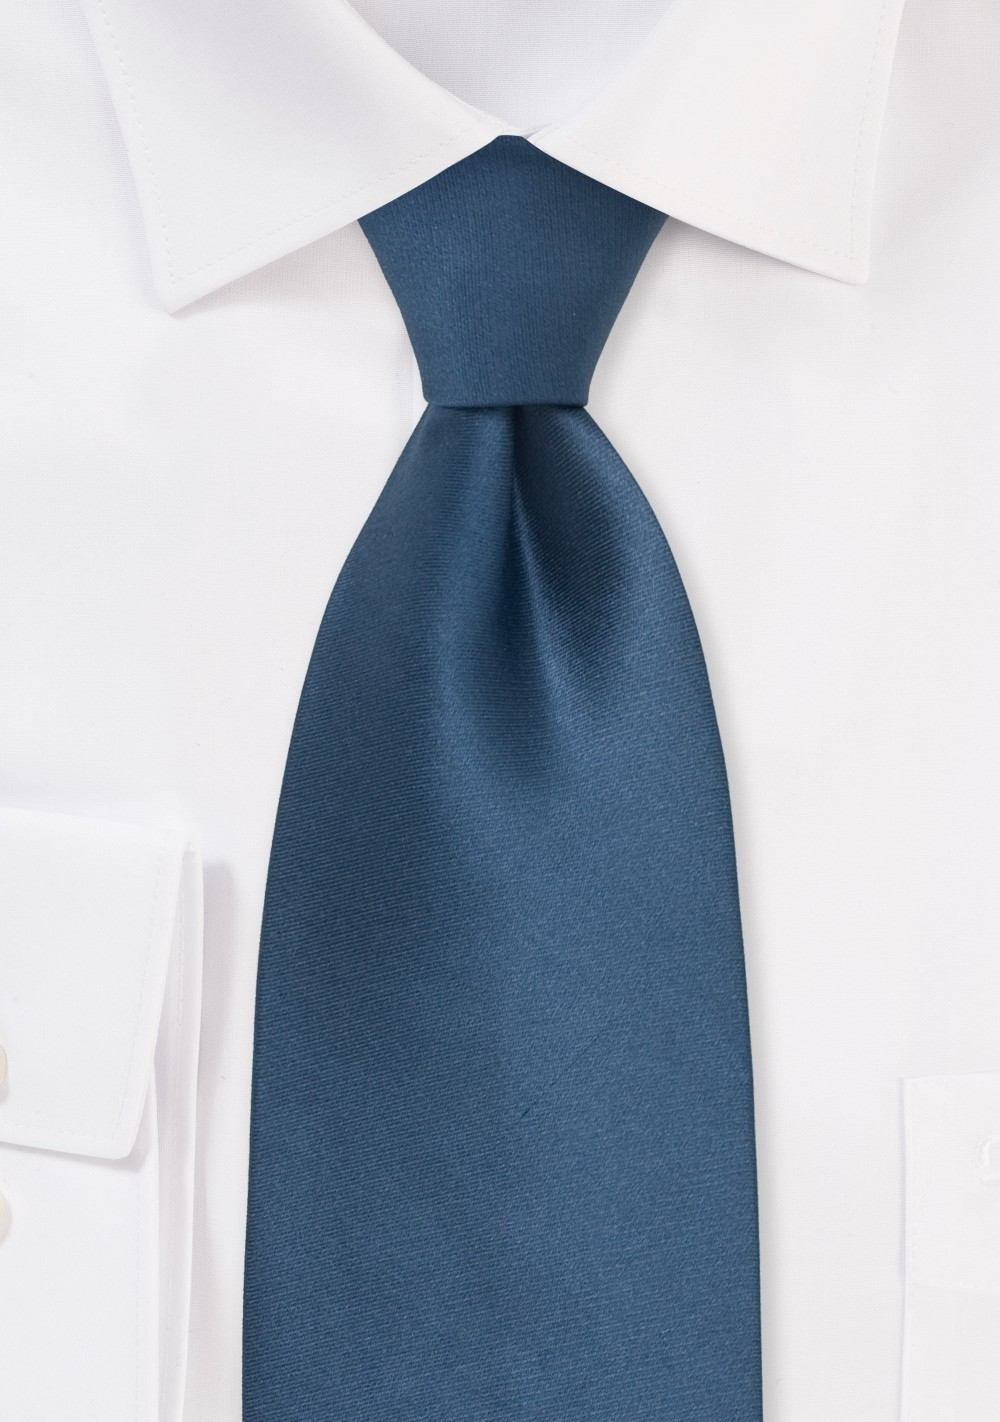 Solid Blue Ties - Necktie in Steel-Blue